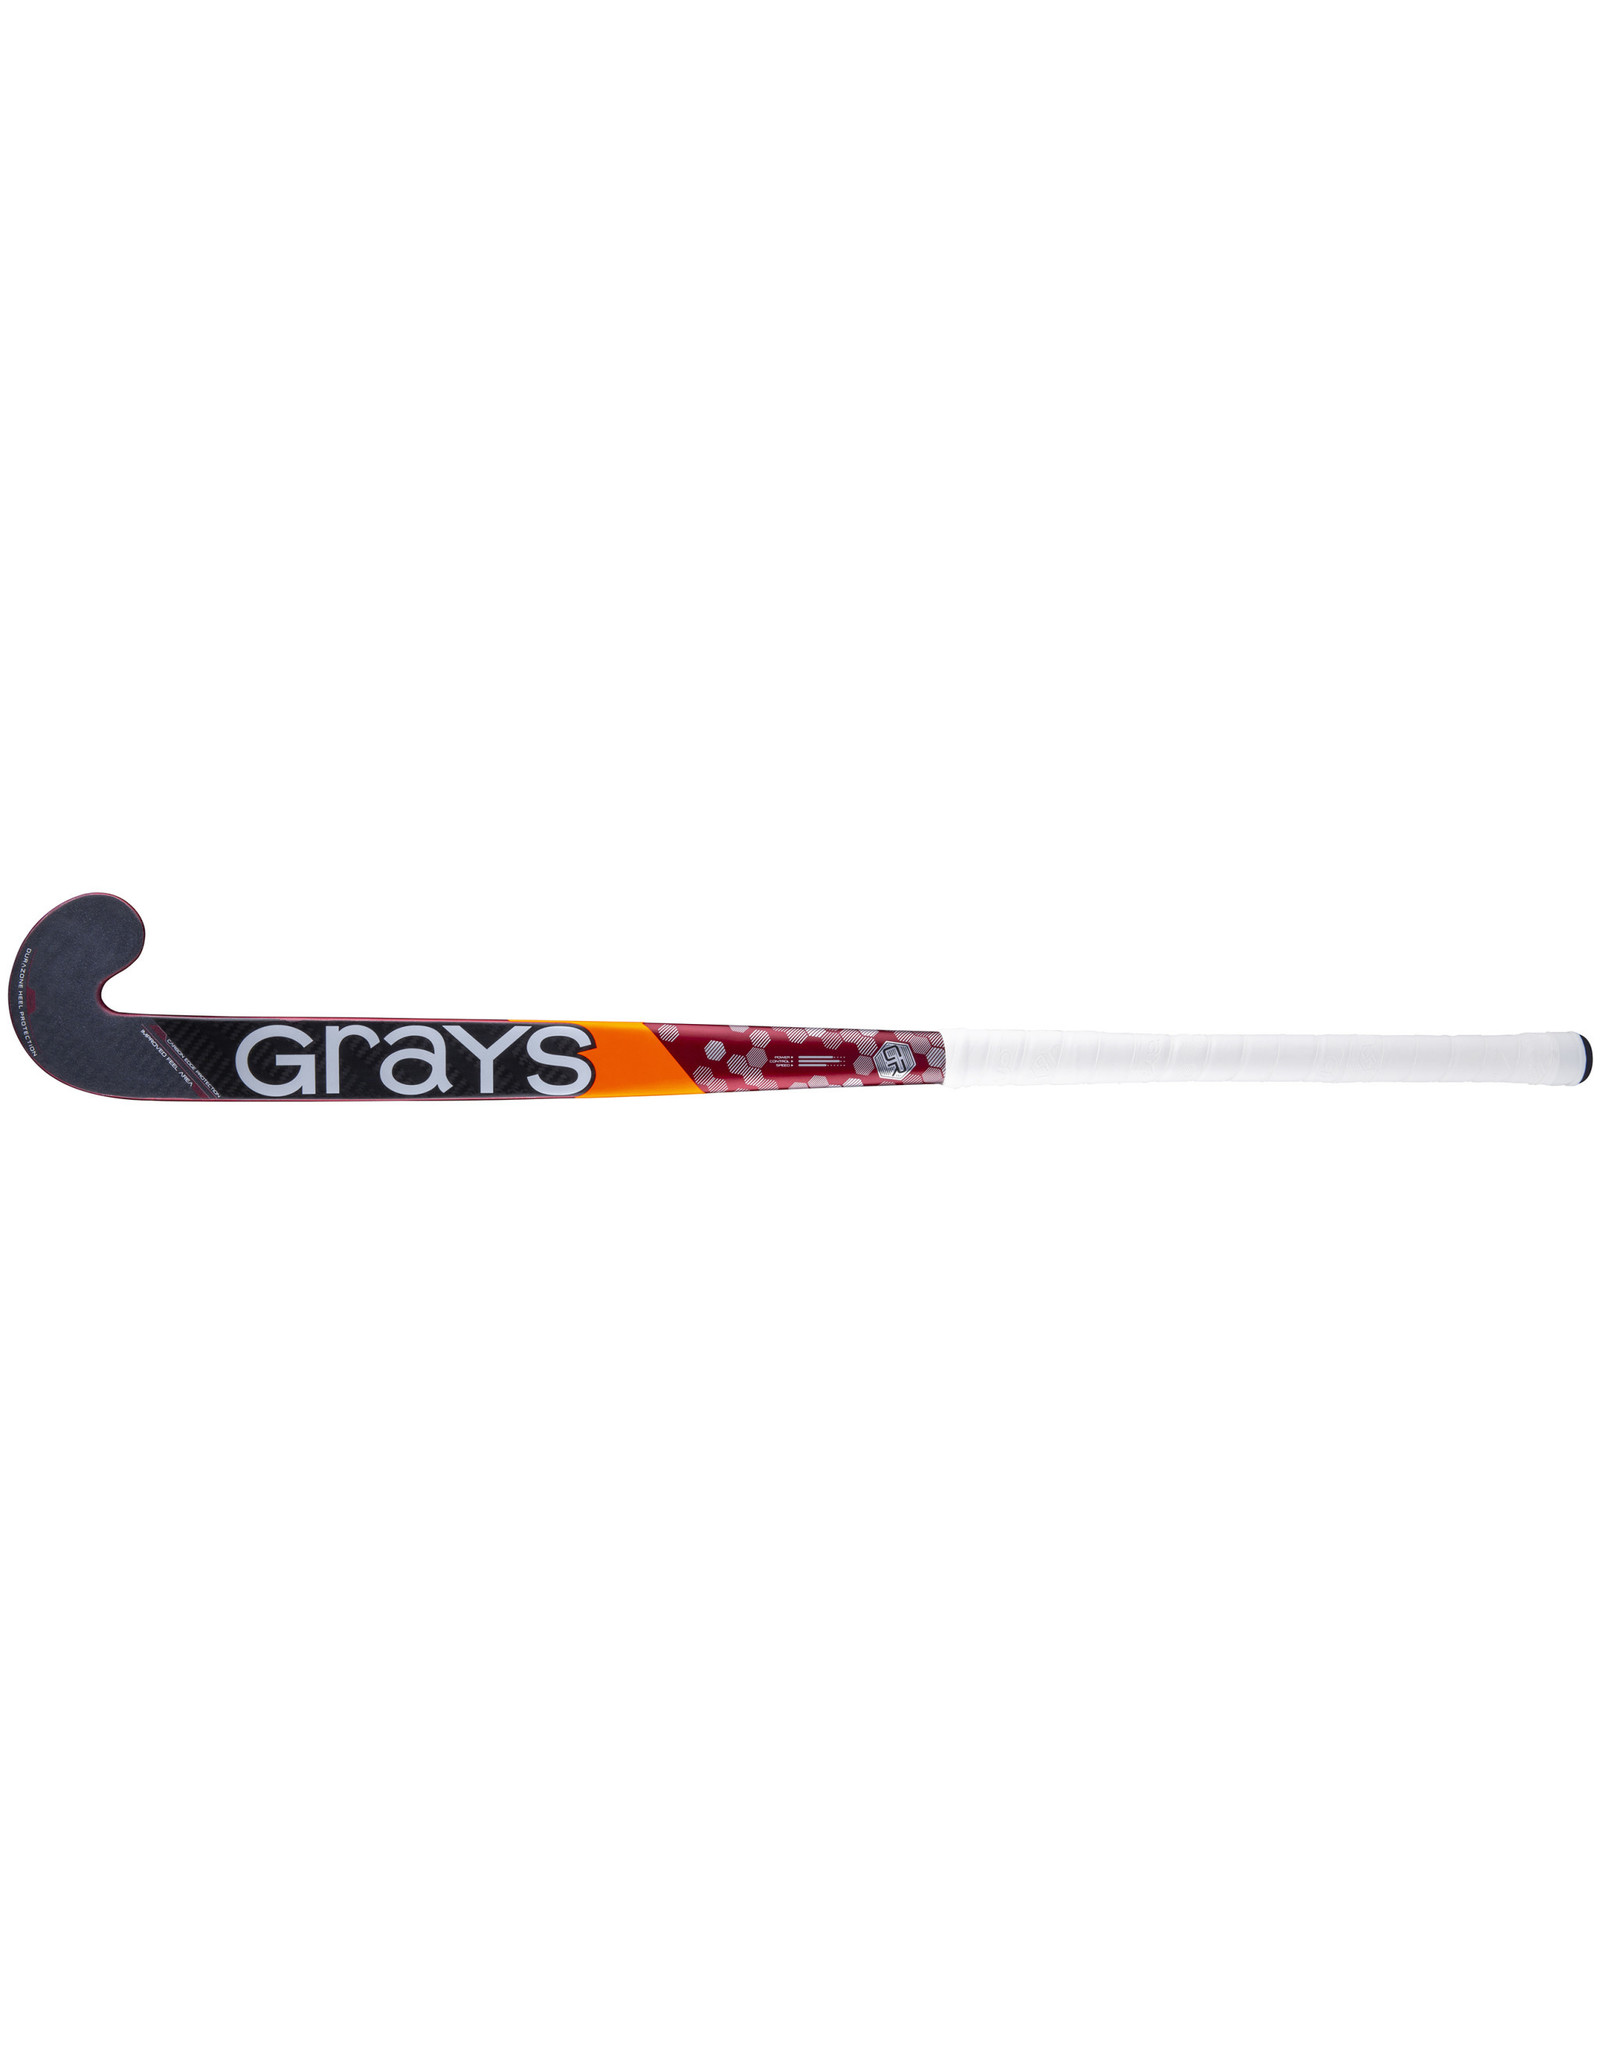 Grays STK GR7000 UB MC